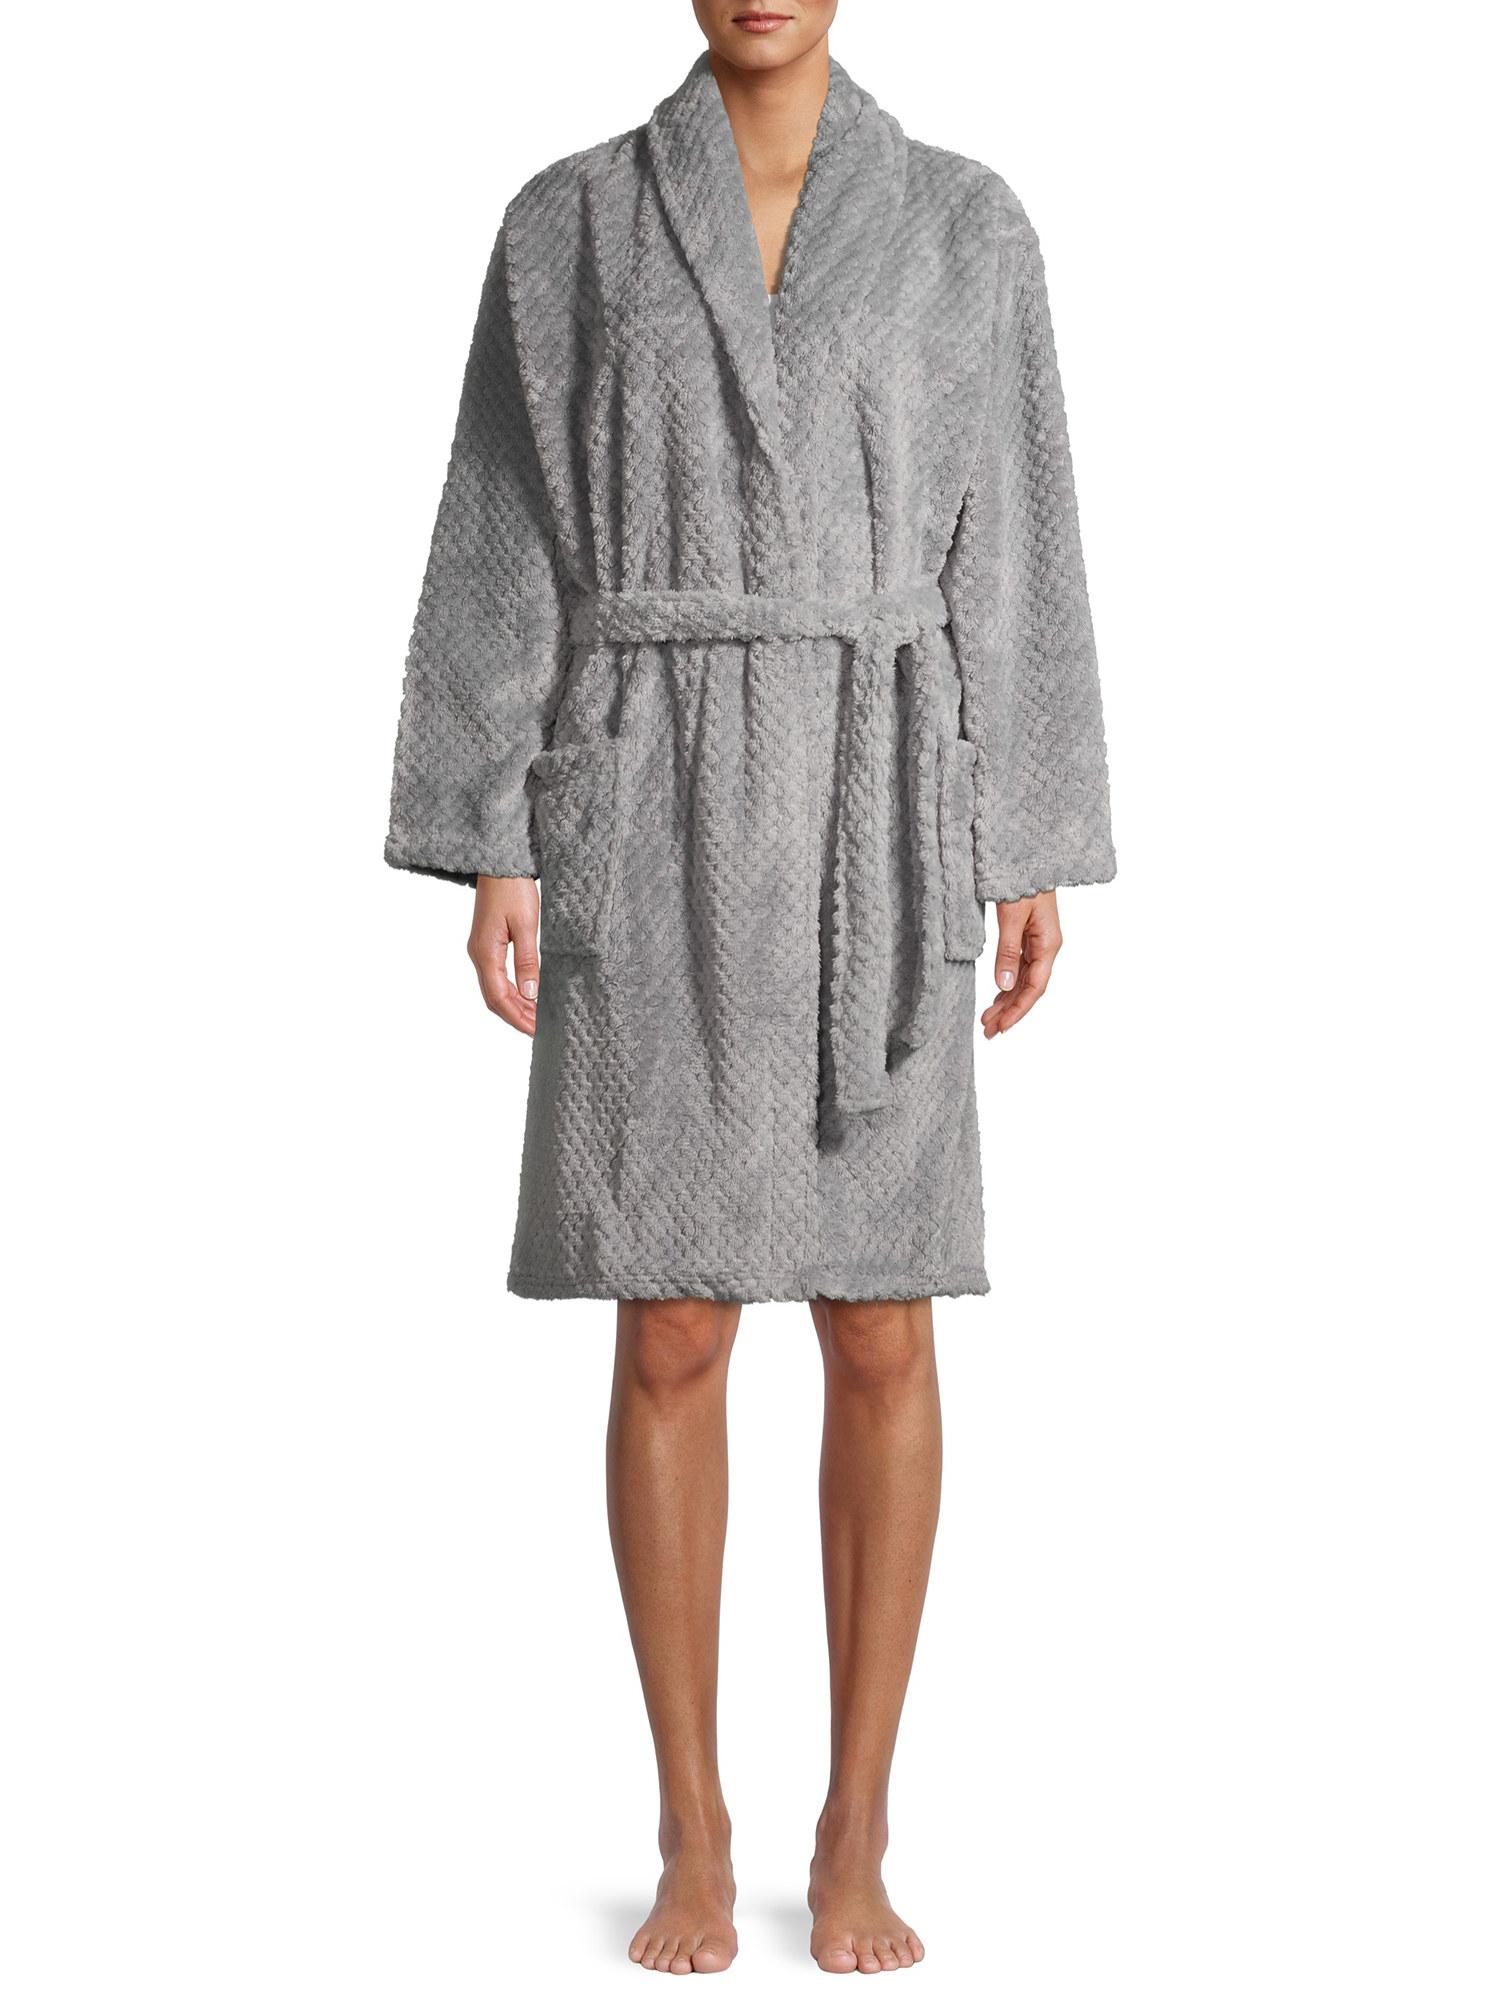 the robe in gray